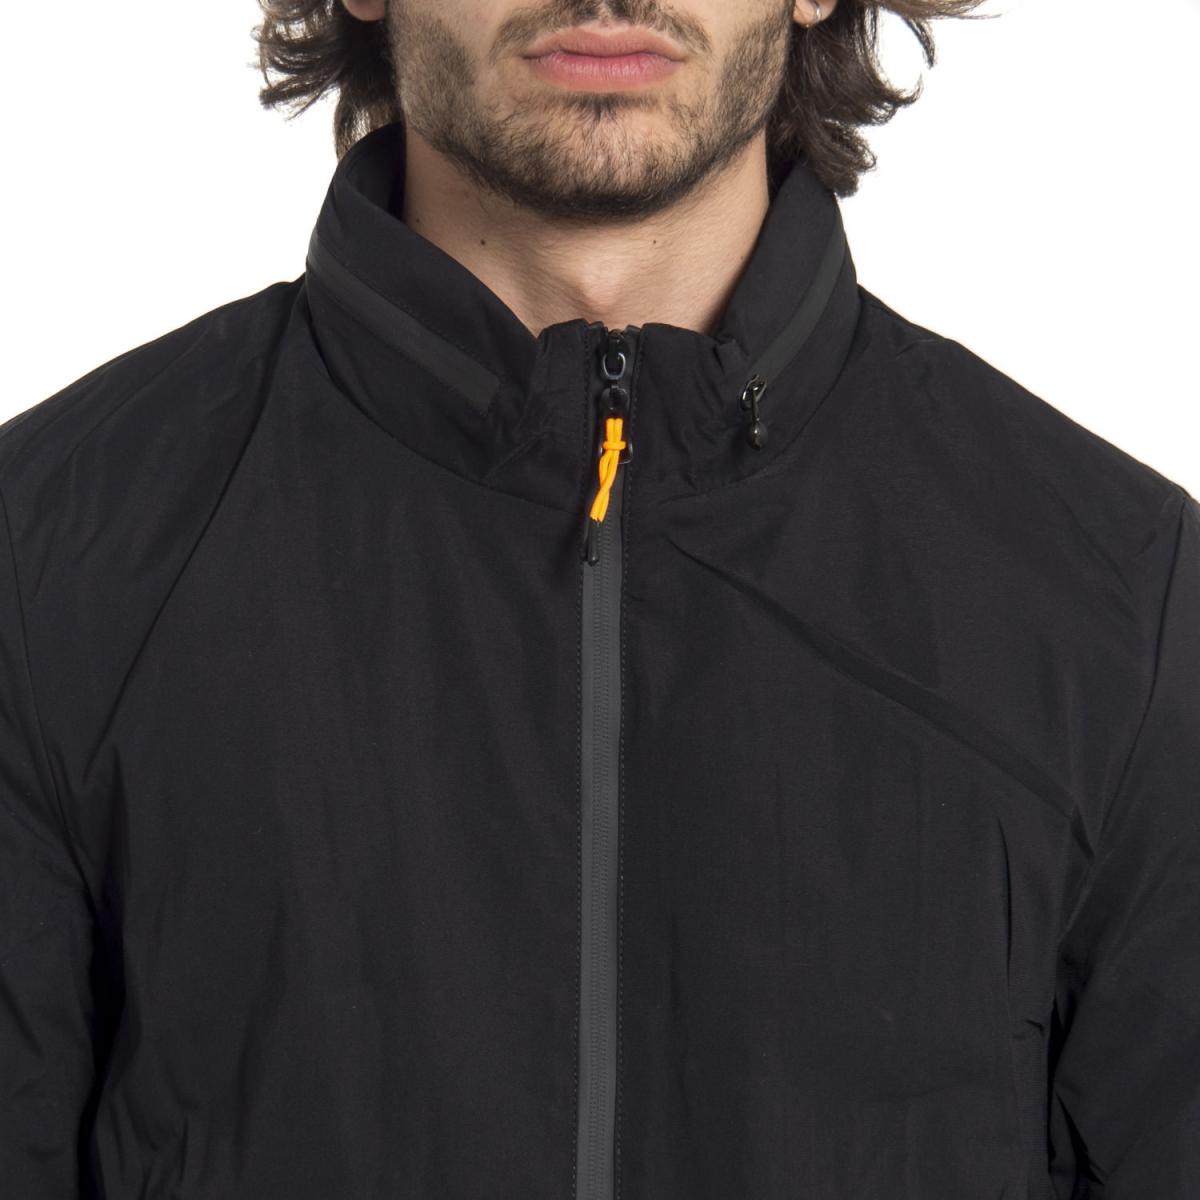 clothing Jackets men Giubbino NMC8815 NEROGRANIT Cafedelmar Shop